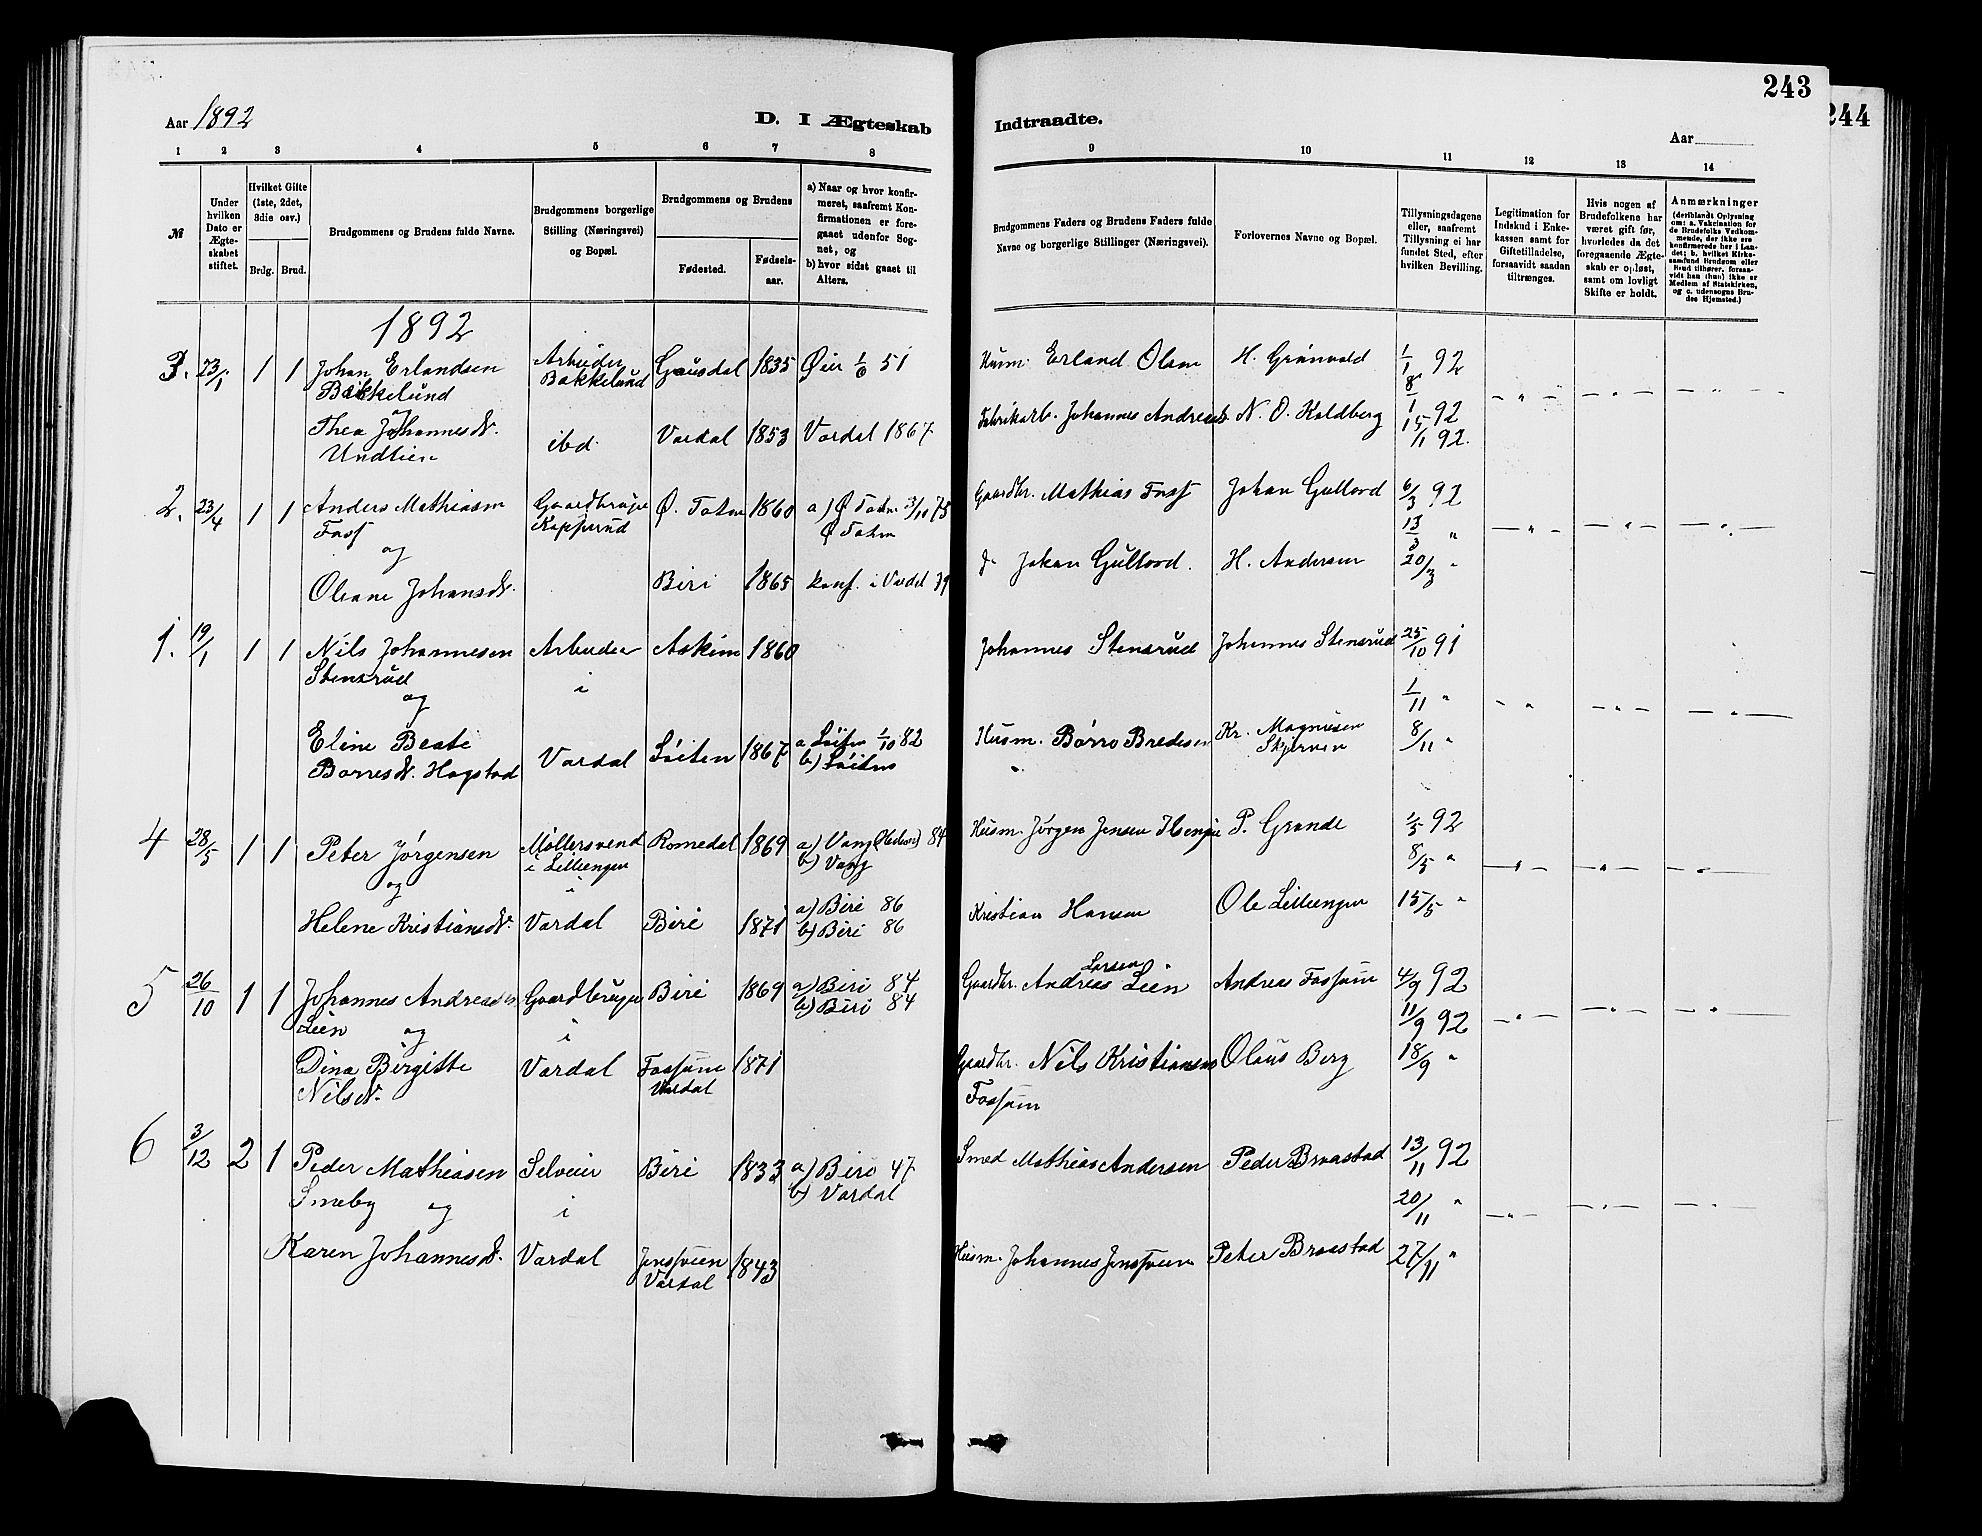 SAH, Vardal prestekontor, H/Ha/Hab/L0007: Klokkerbok nr. 7 /1, 1881-1895, s. 243